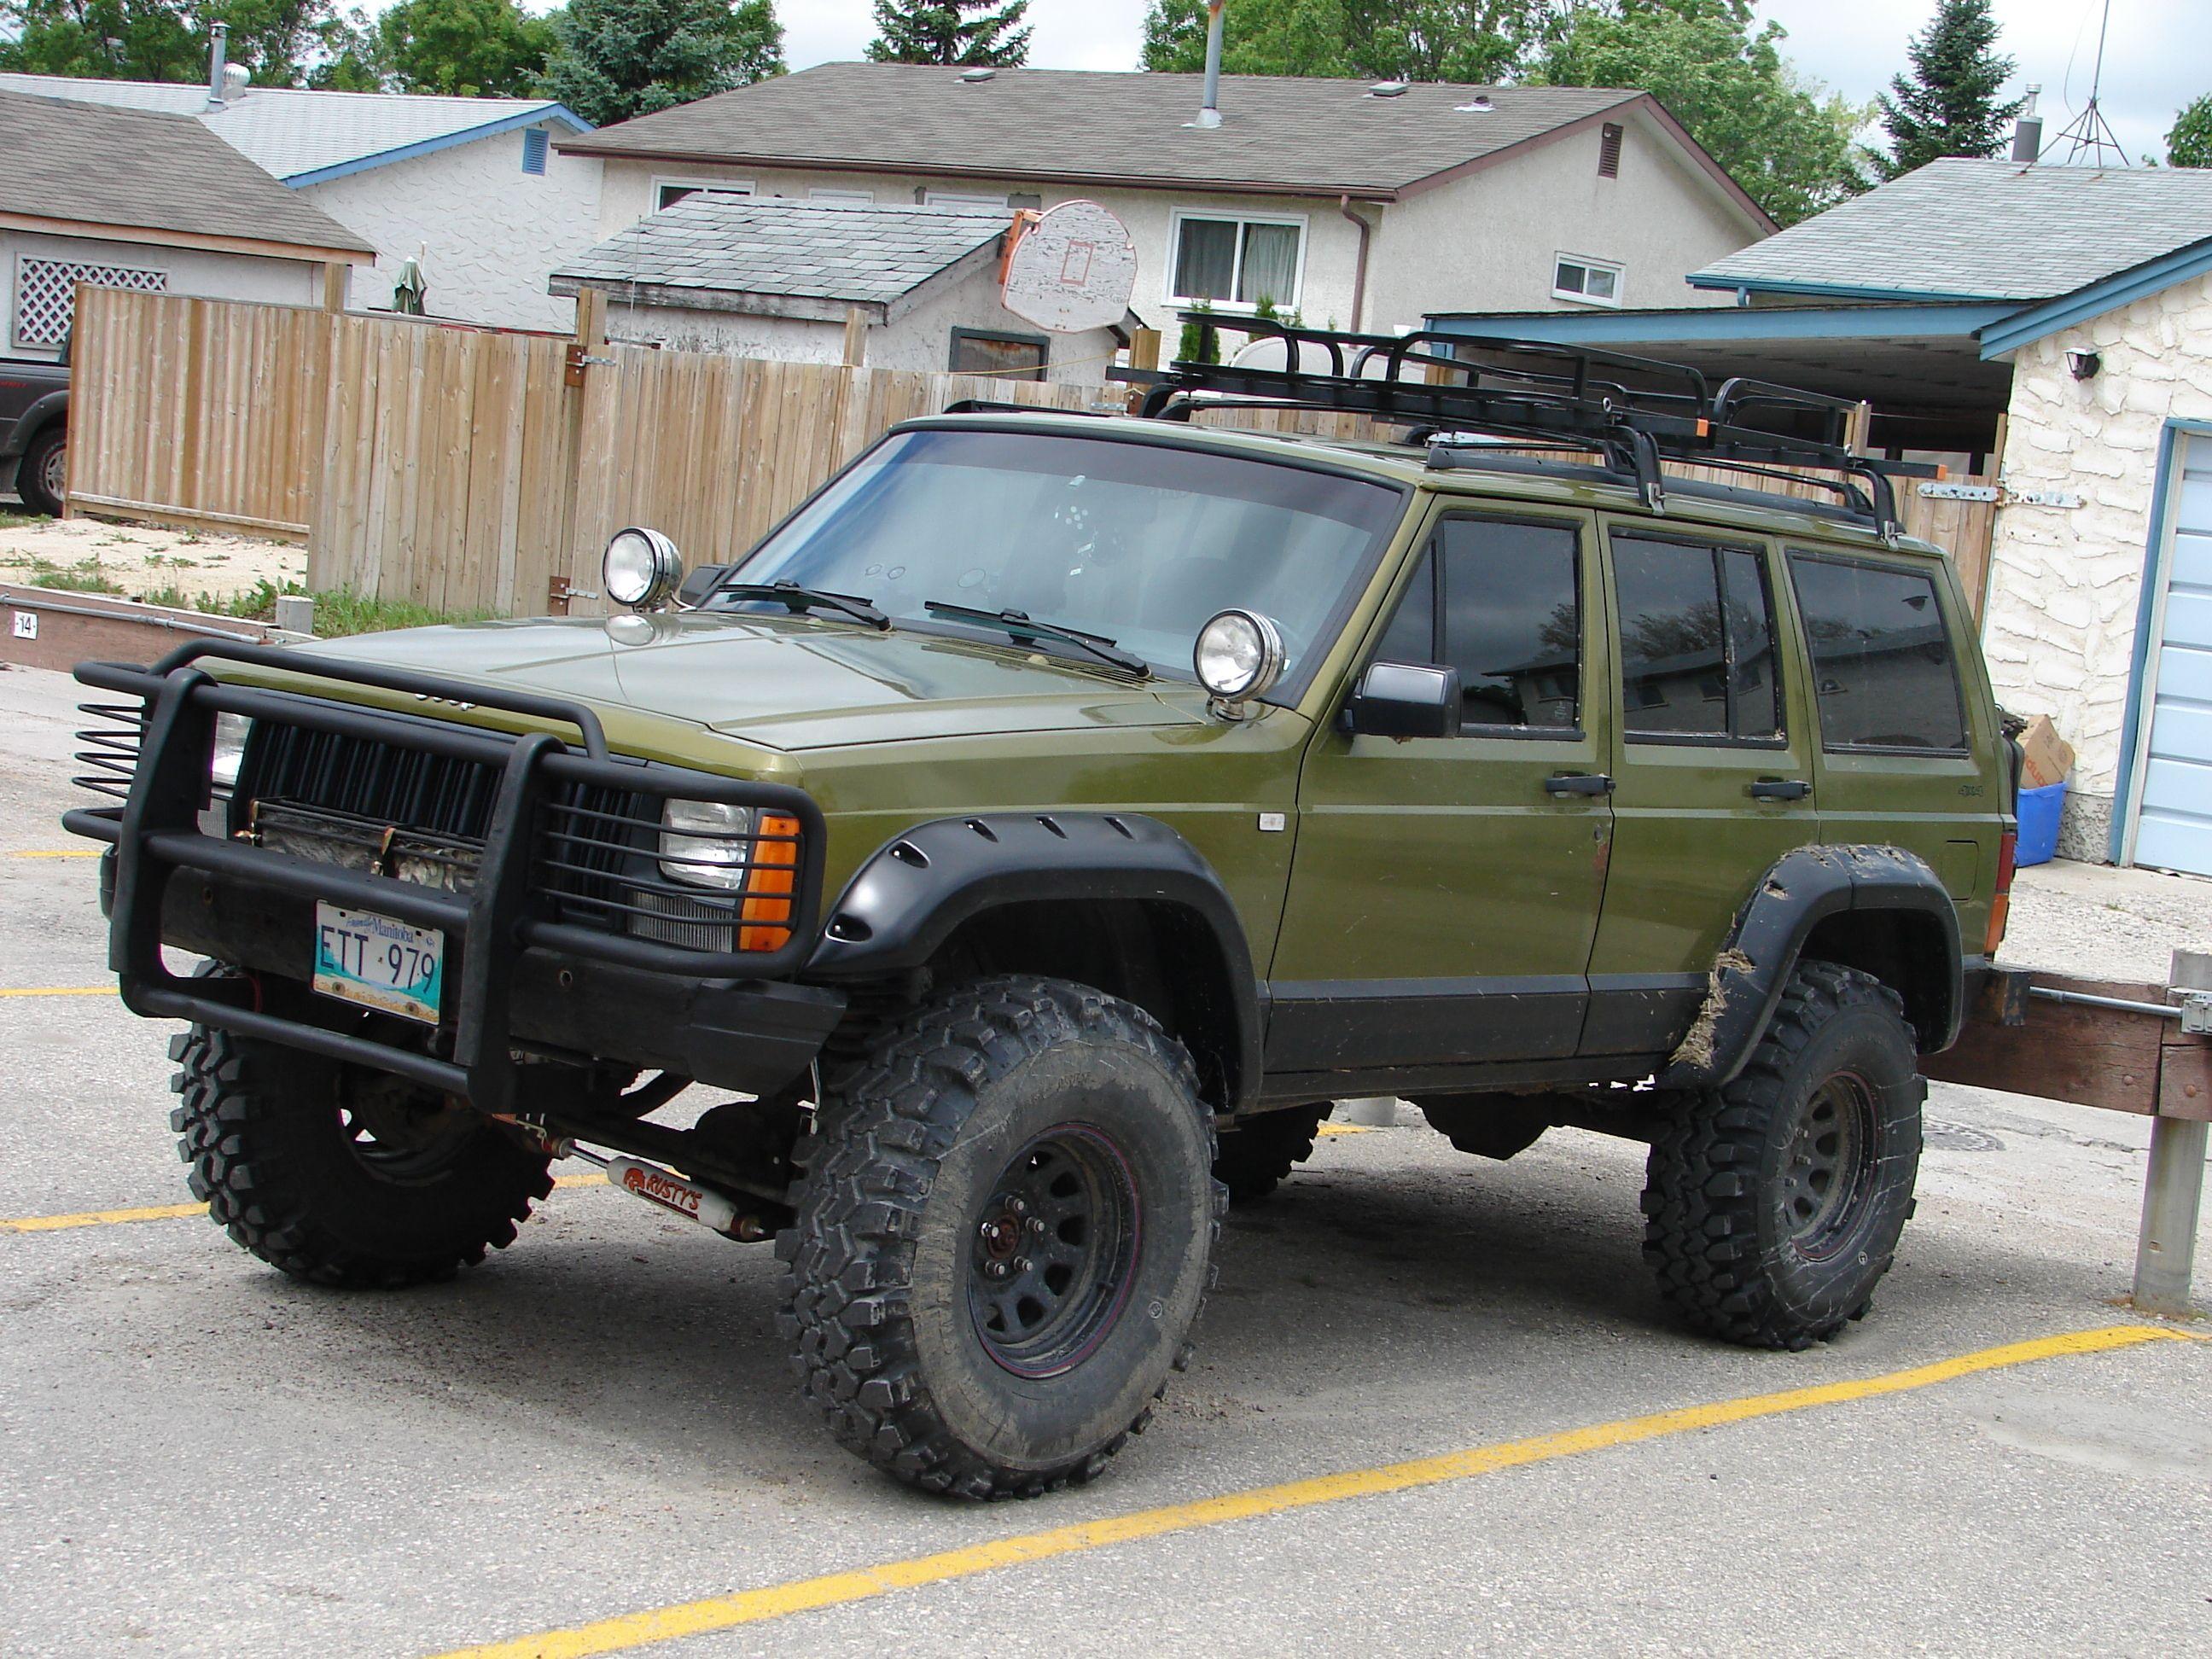 bjgreenham 1996 jeep cherokee 33483260034 original jeep xj cherokee mj comanche pinterest. Black Bedroom Furniture Sets. Home Design Ideas